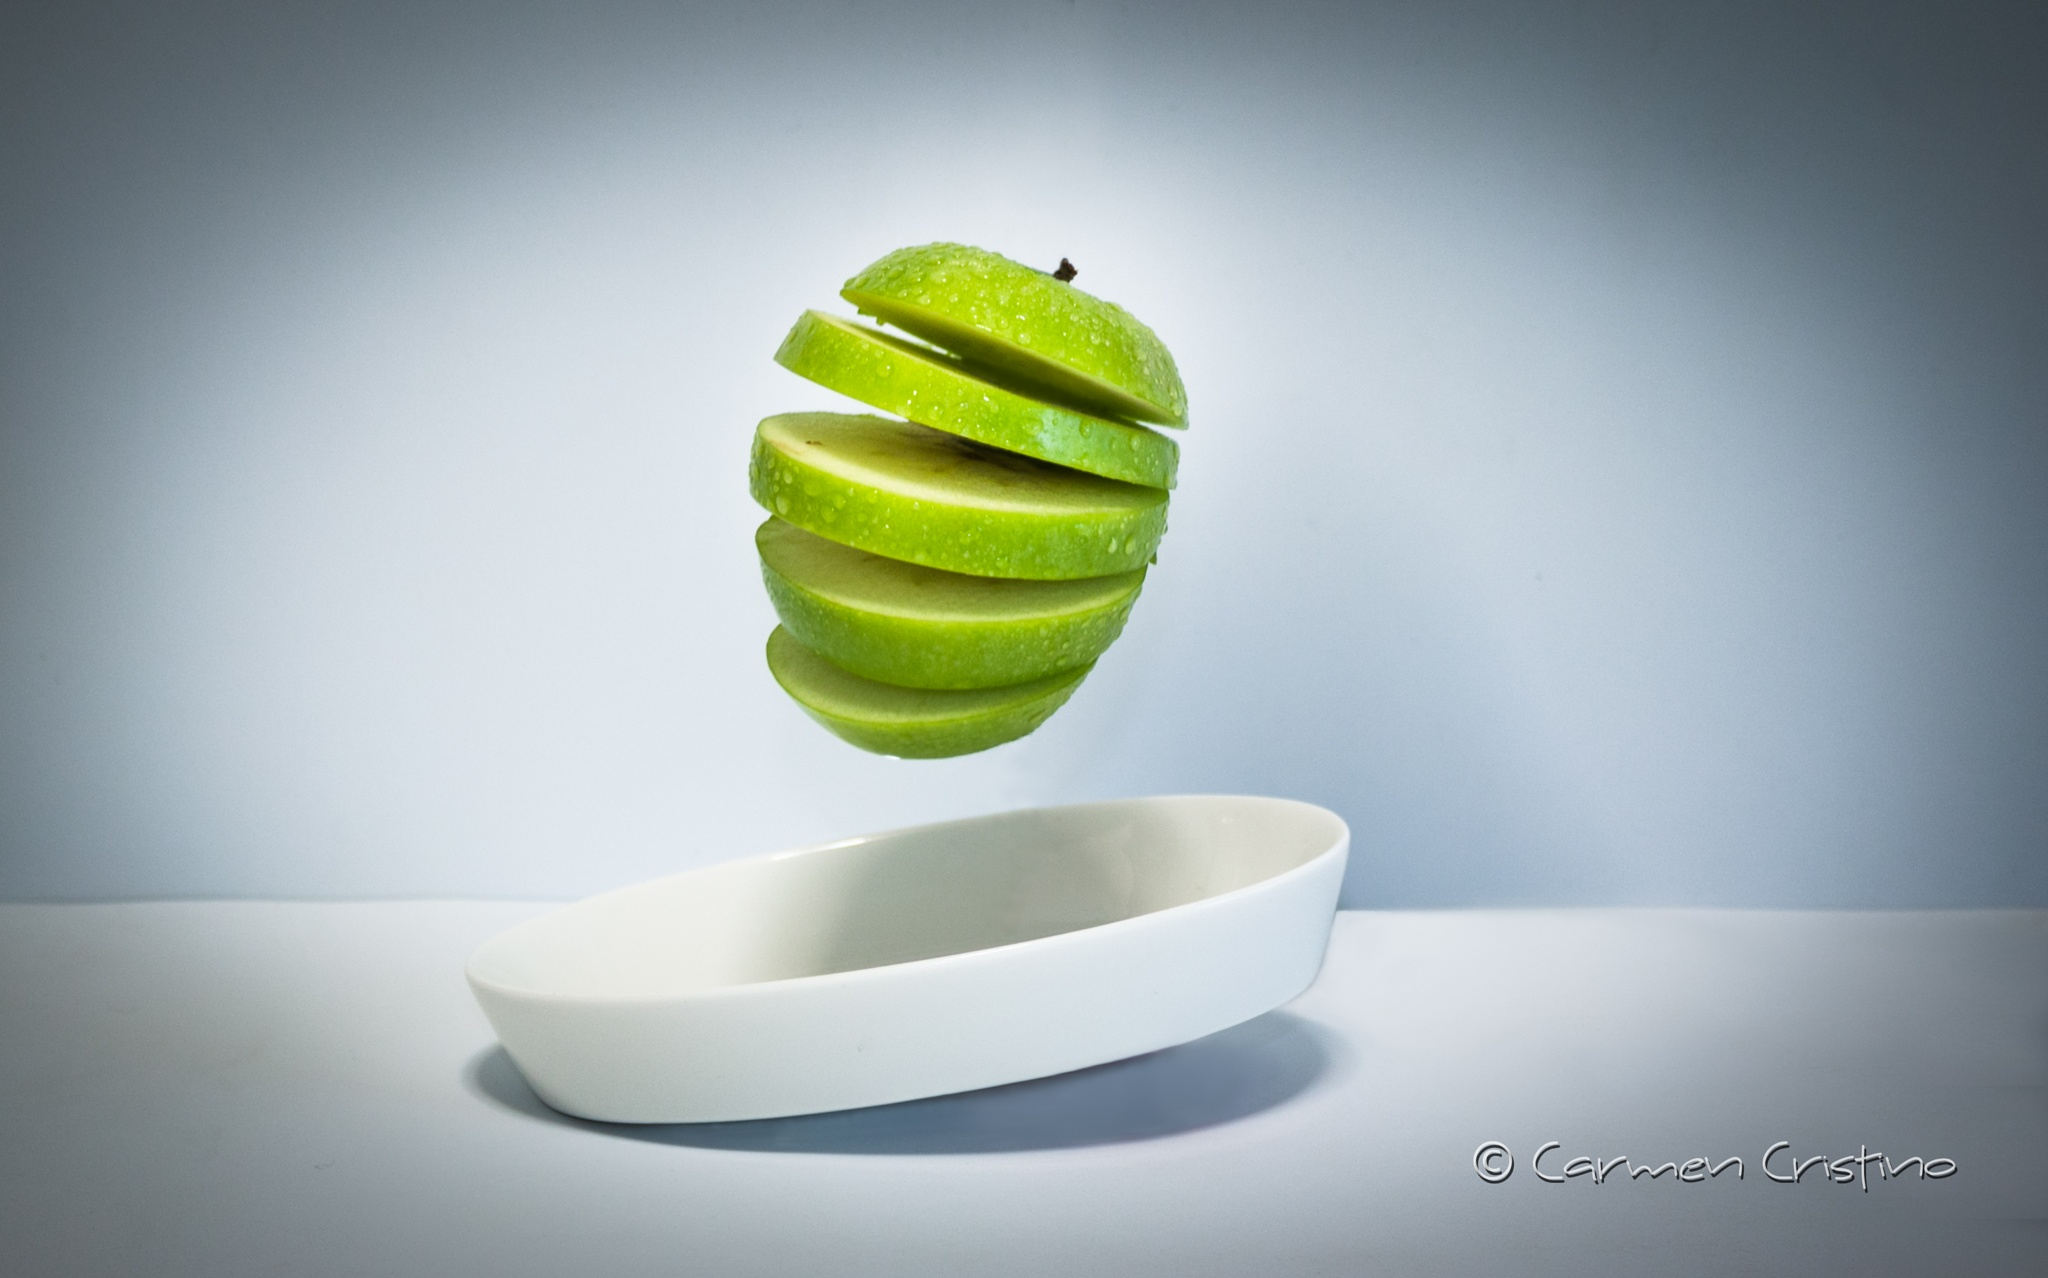 Green apple by carmen_cristino